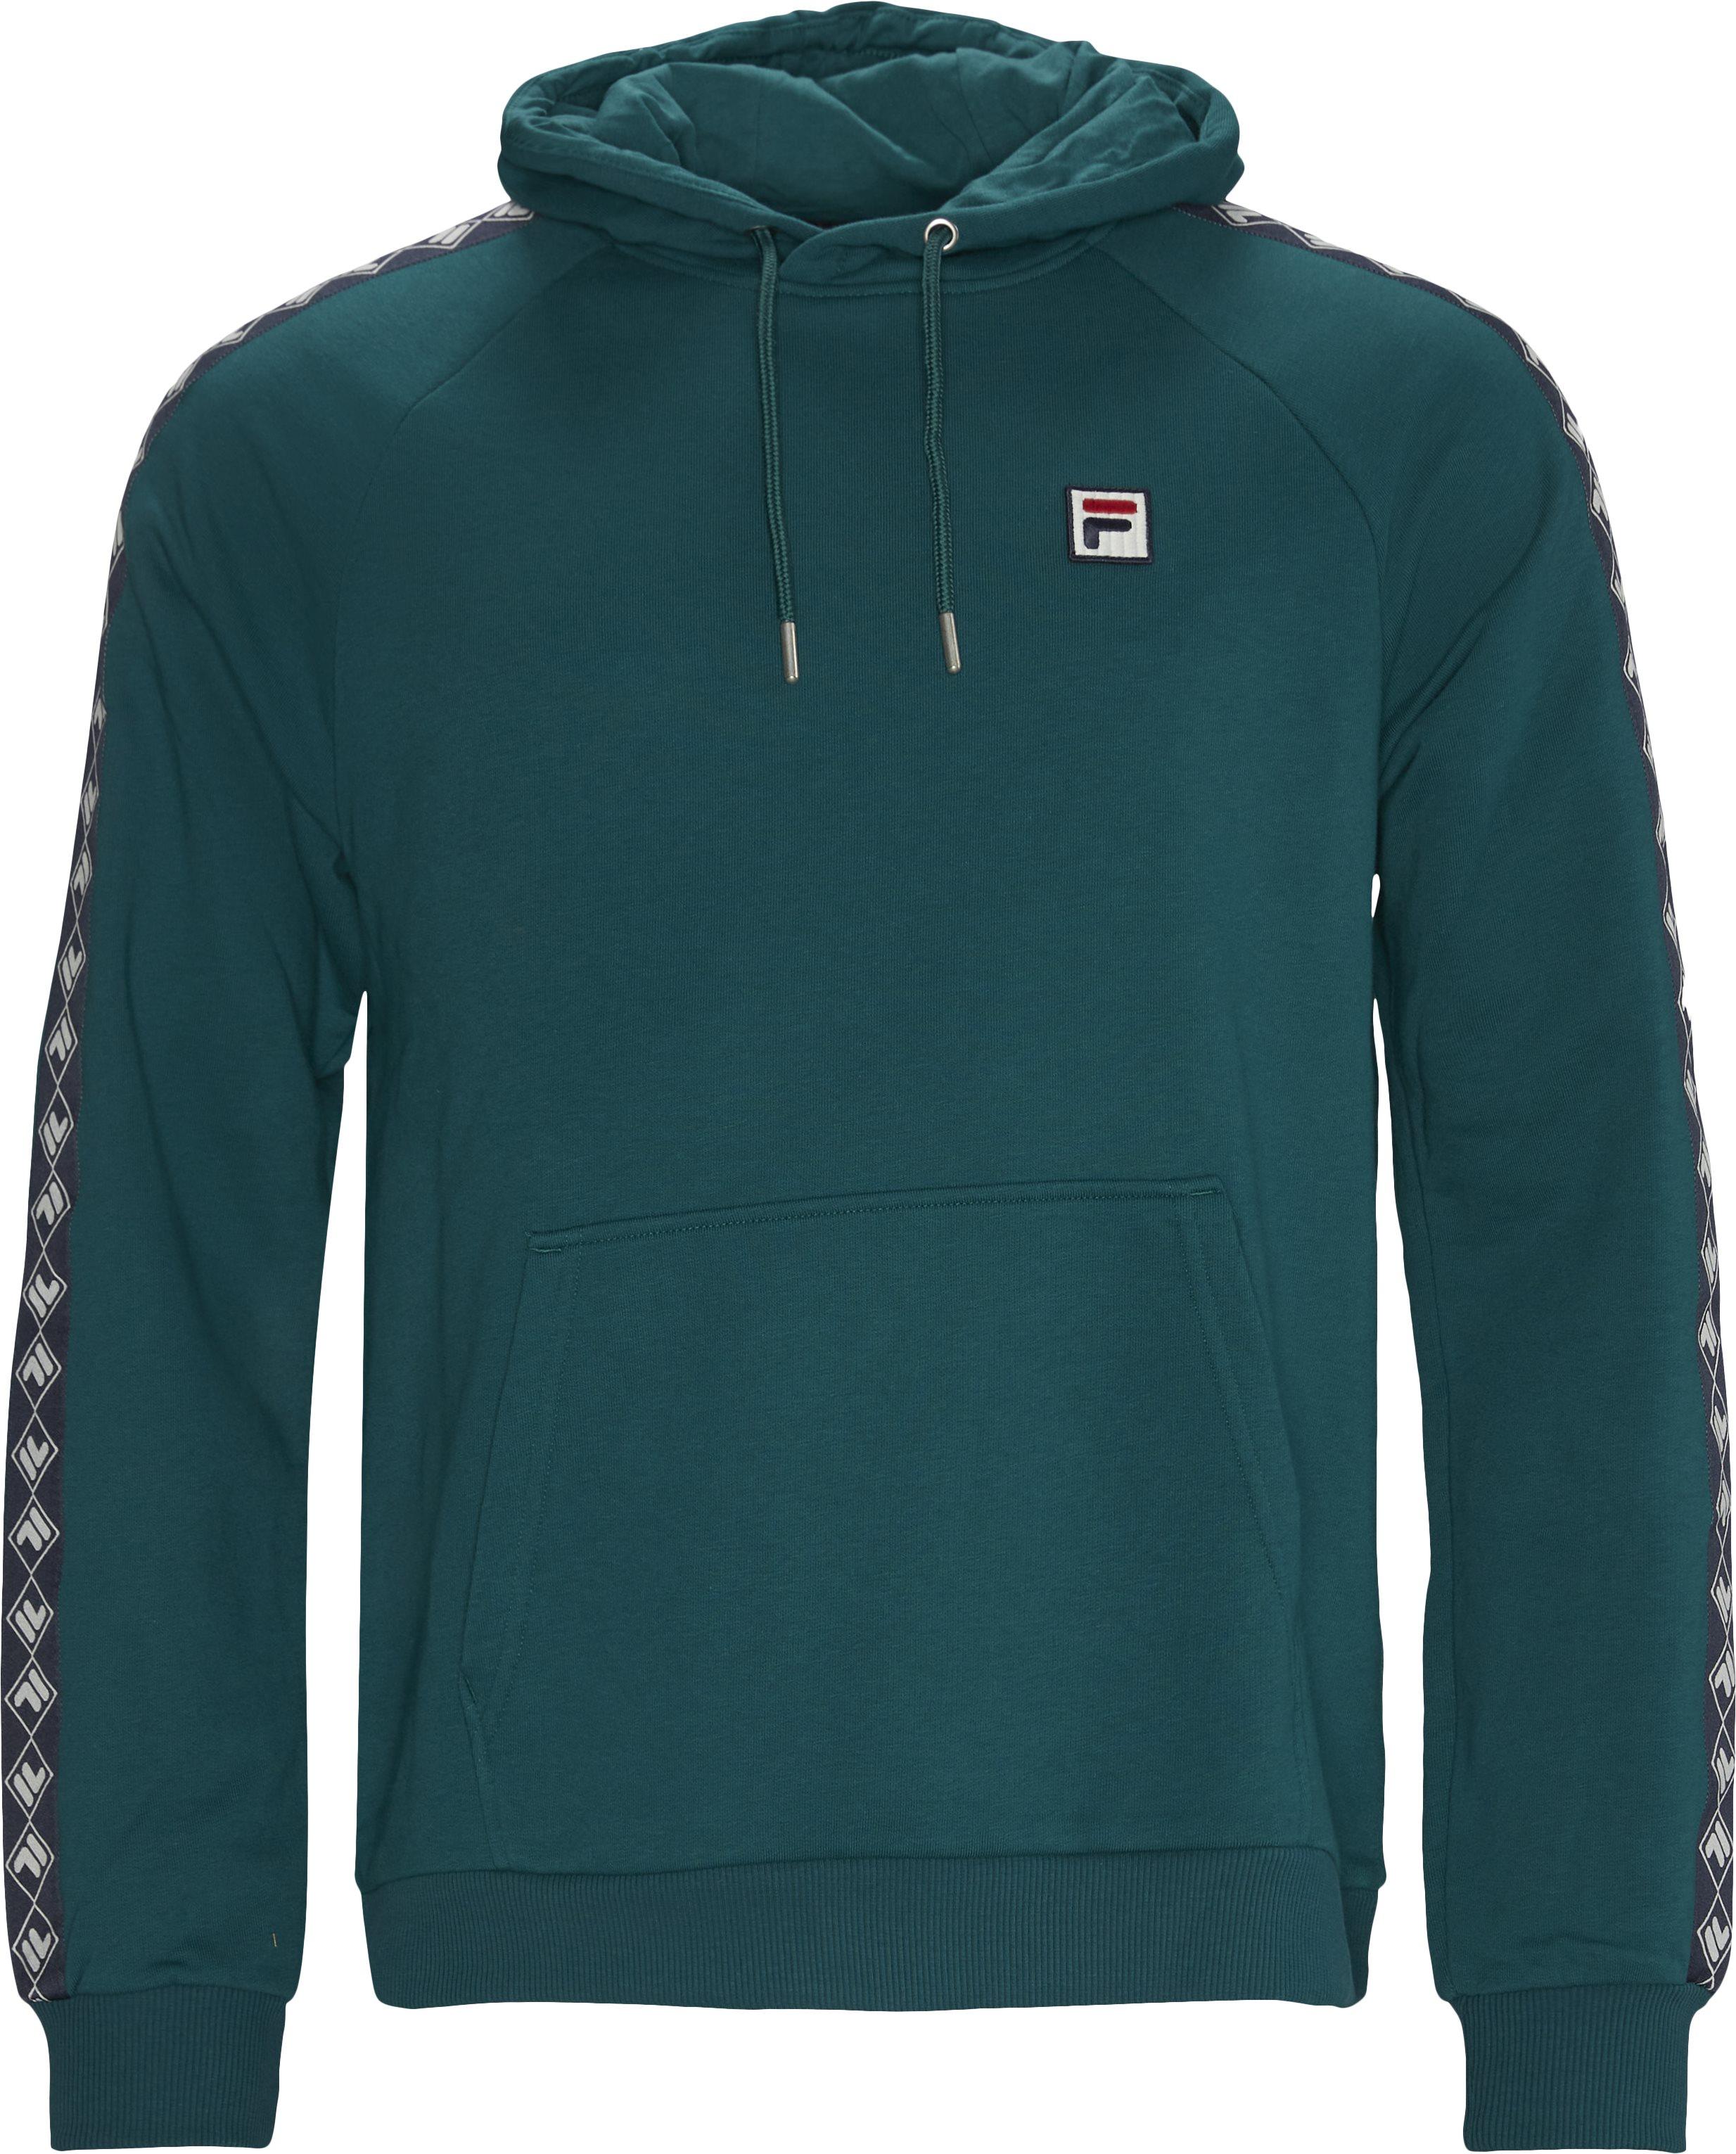 Hudd Hoodie - Sweatshirts - Regular fit - Grøn